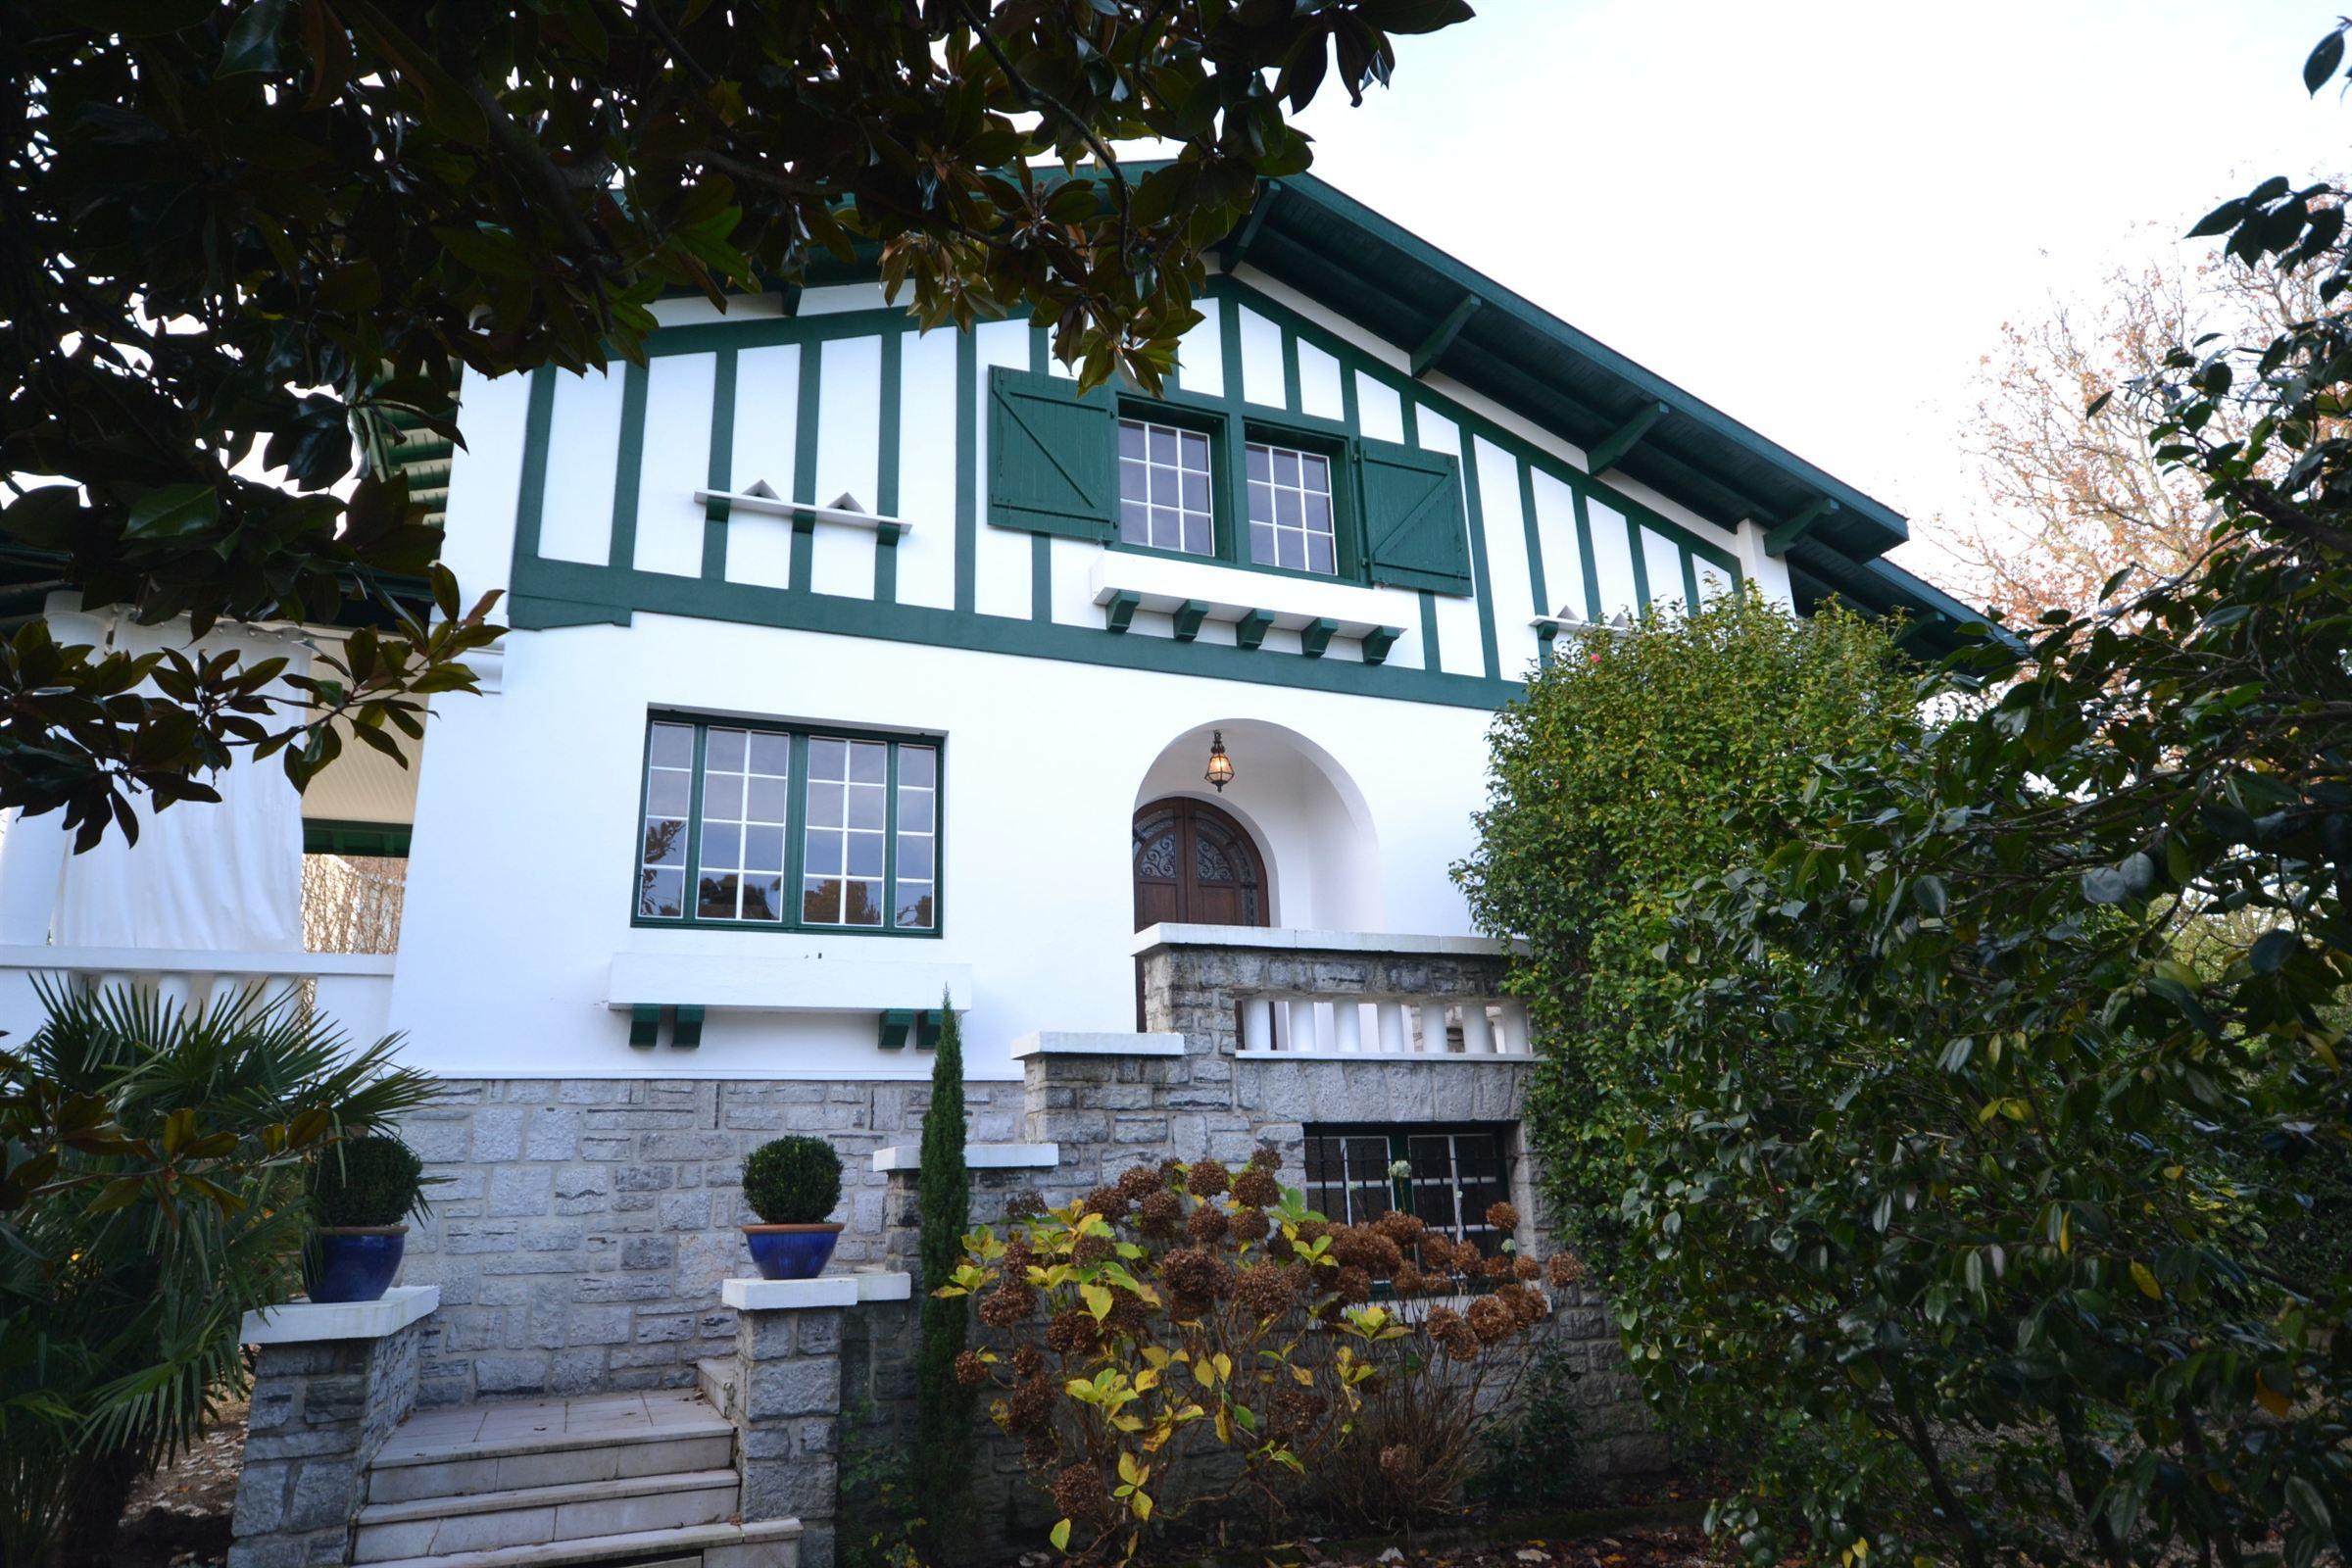 Single Family Home for Sale at BIARRITZ LE PARC D'HIVER Biarritz, Aquitaine, 64200 France